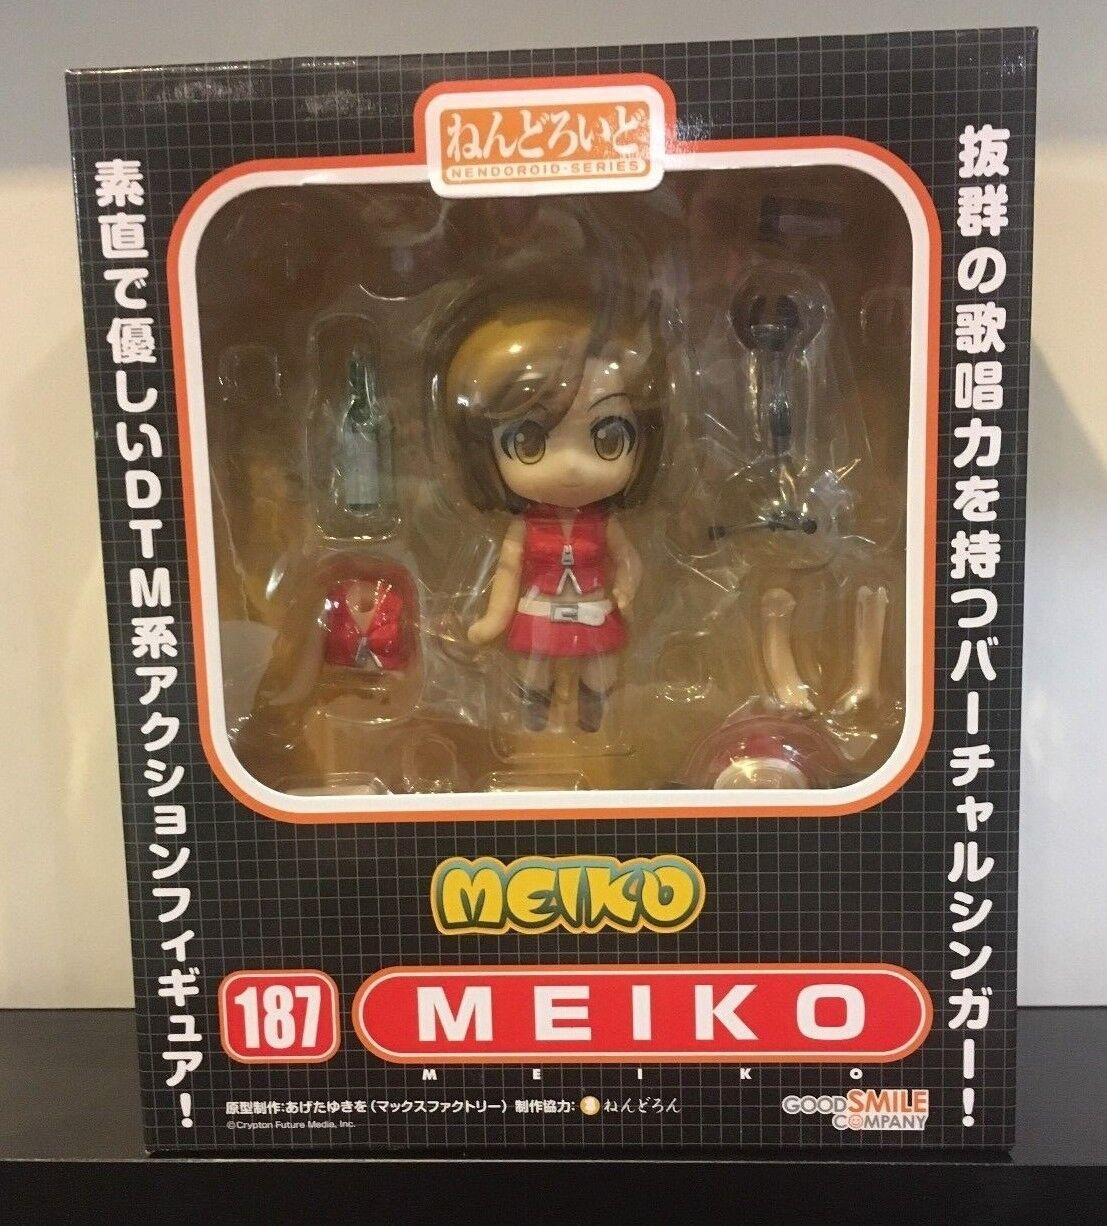 Nendgoldid 187 Meiko  Vocaloid Good Smile Company JAPAN